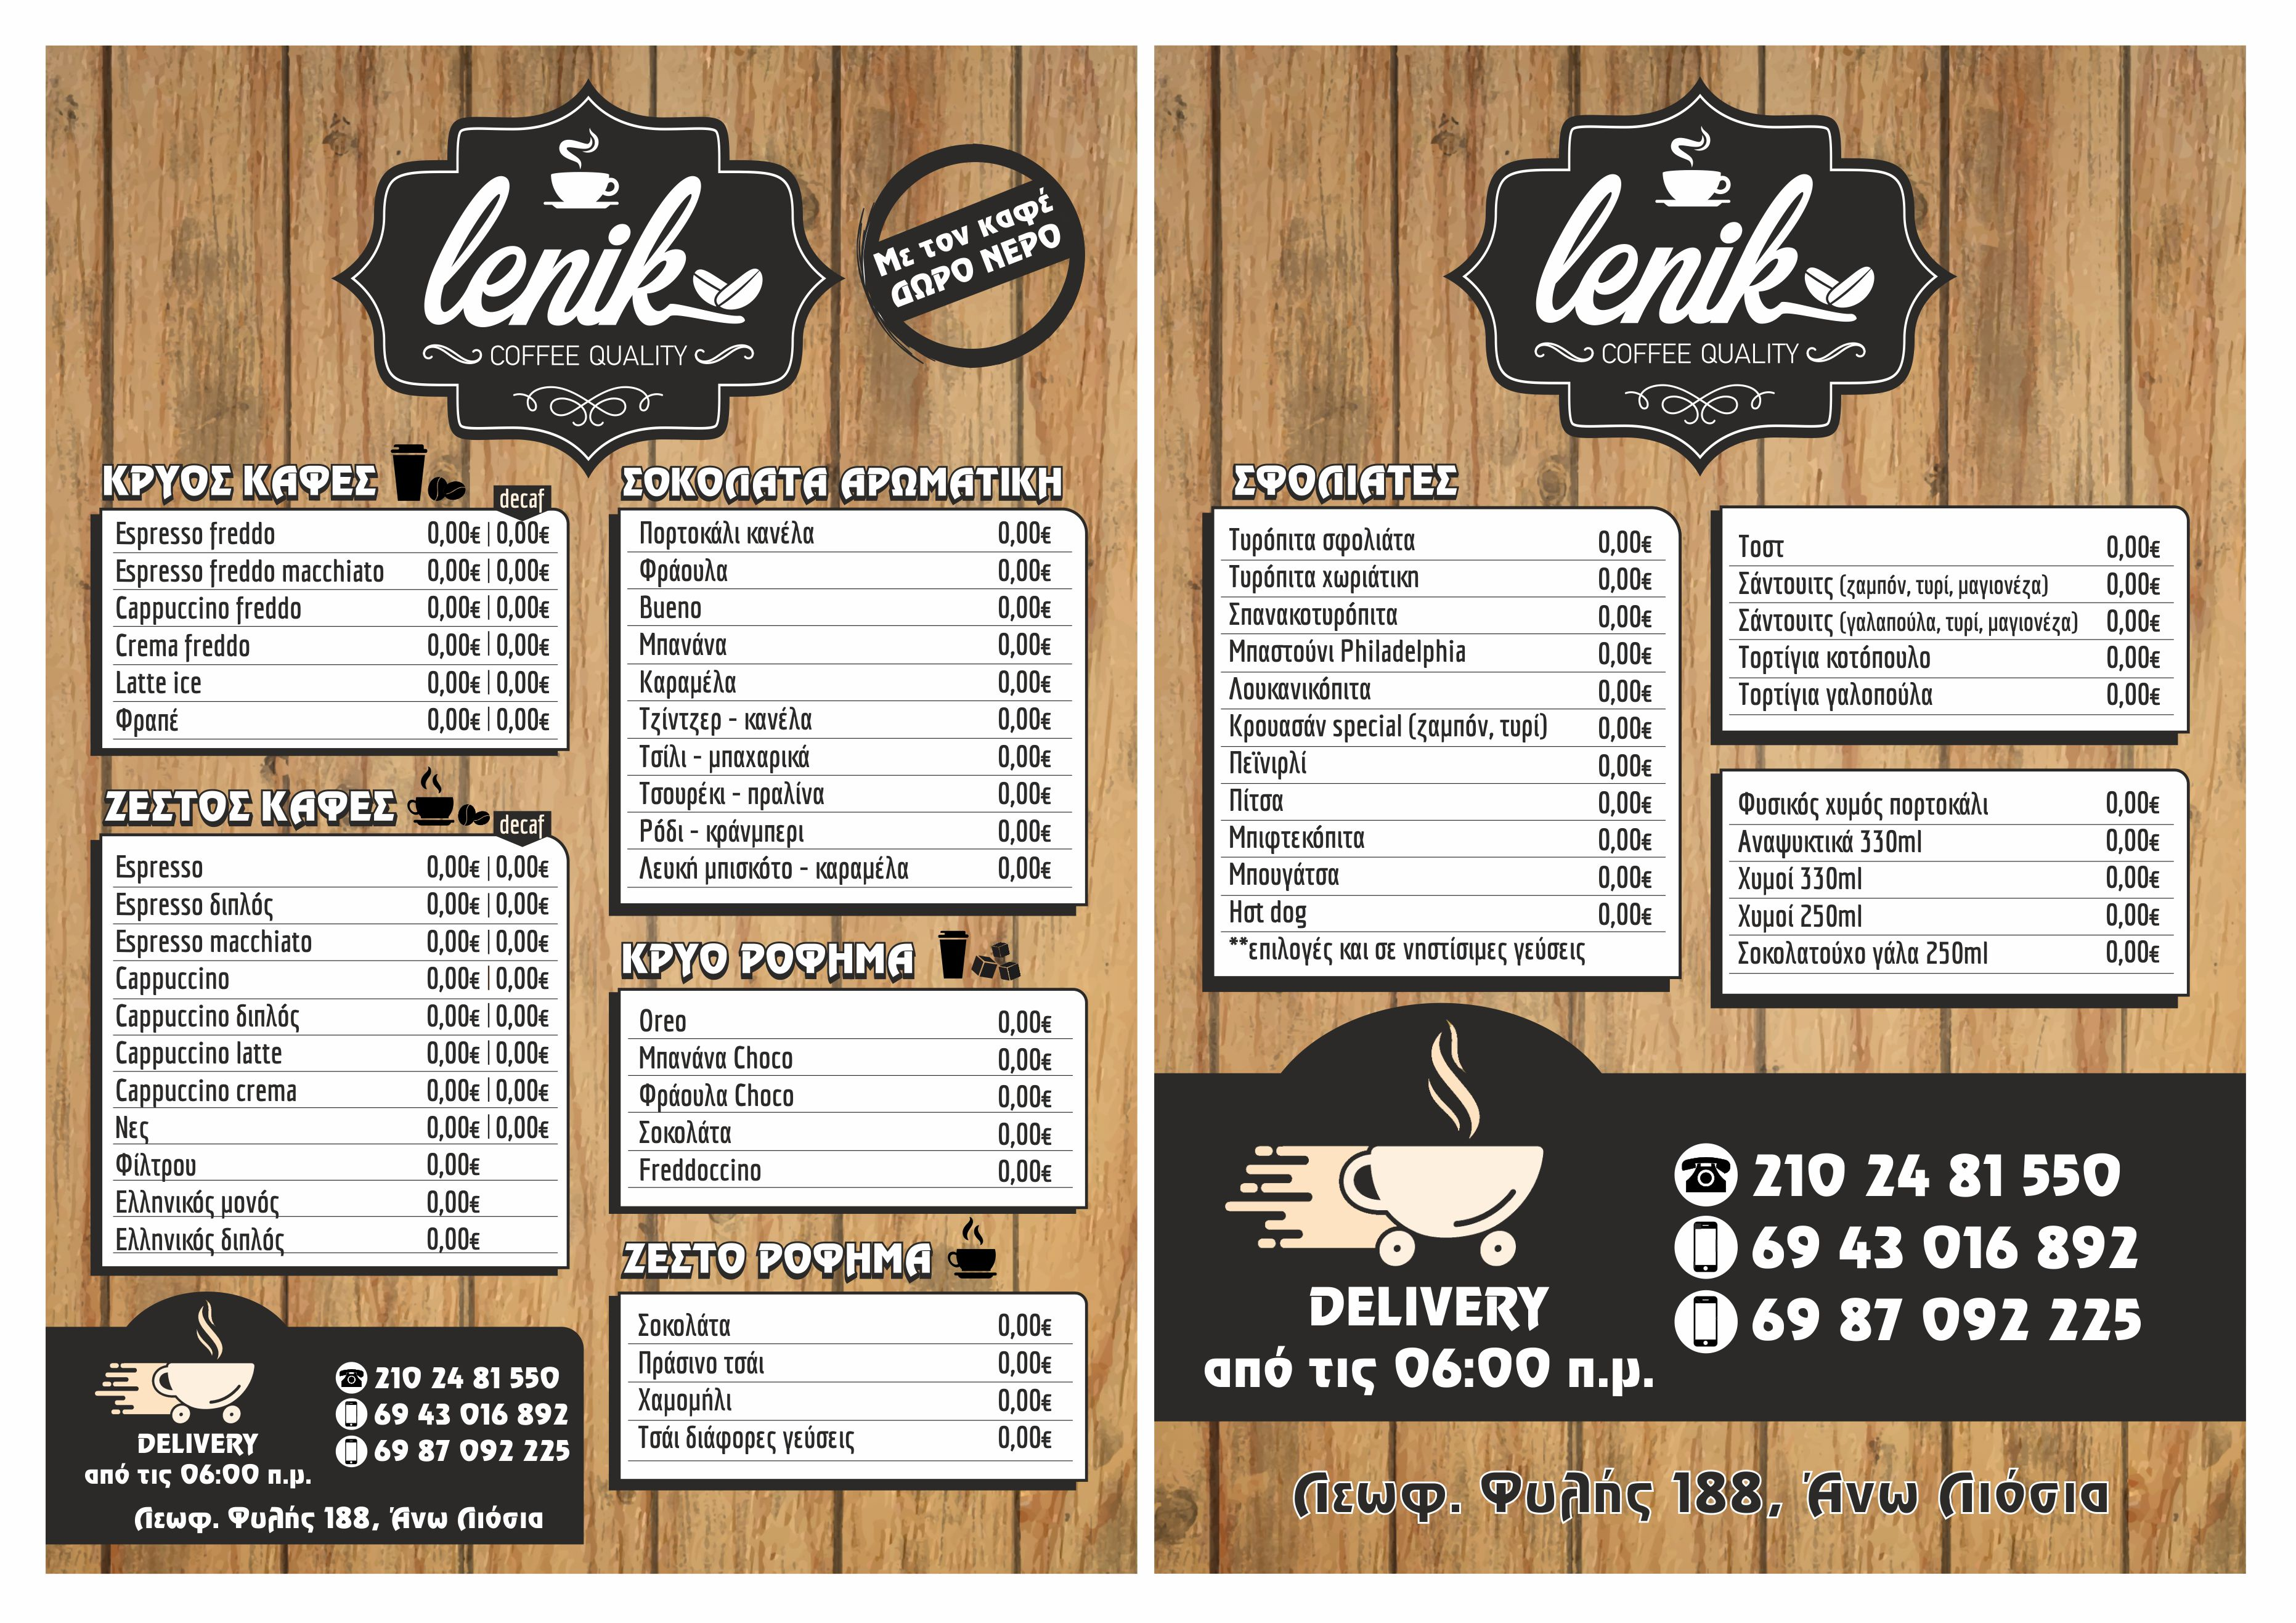 lenik coffee menu